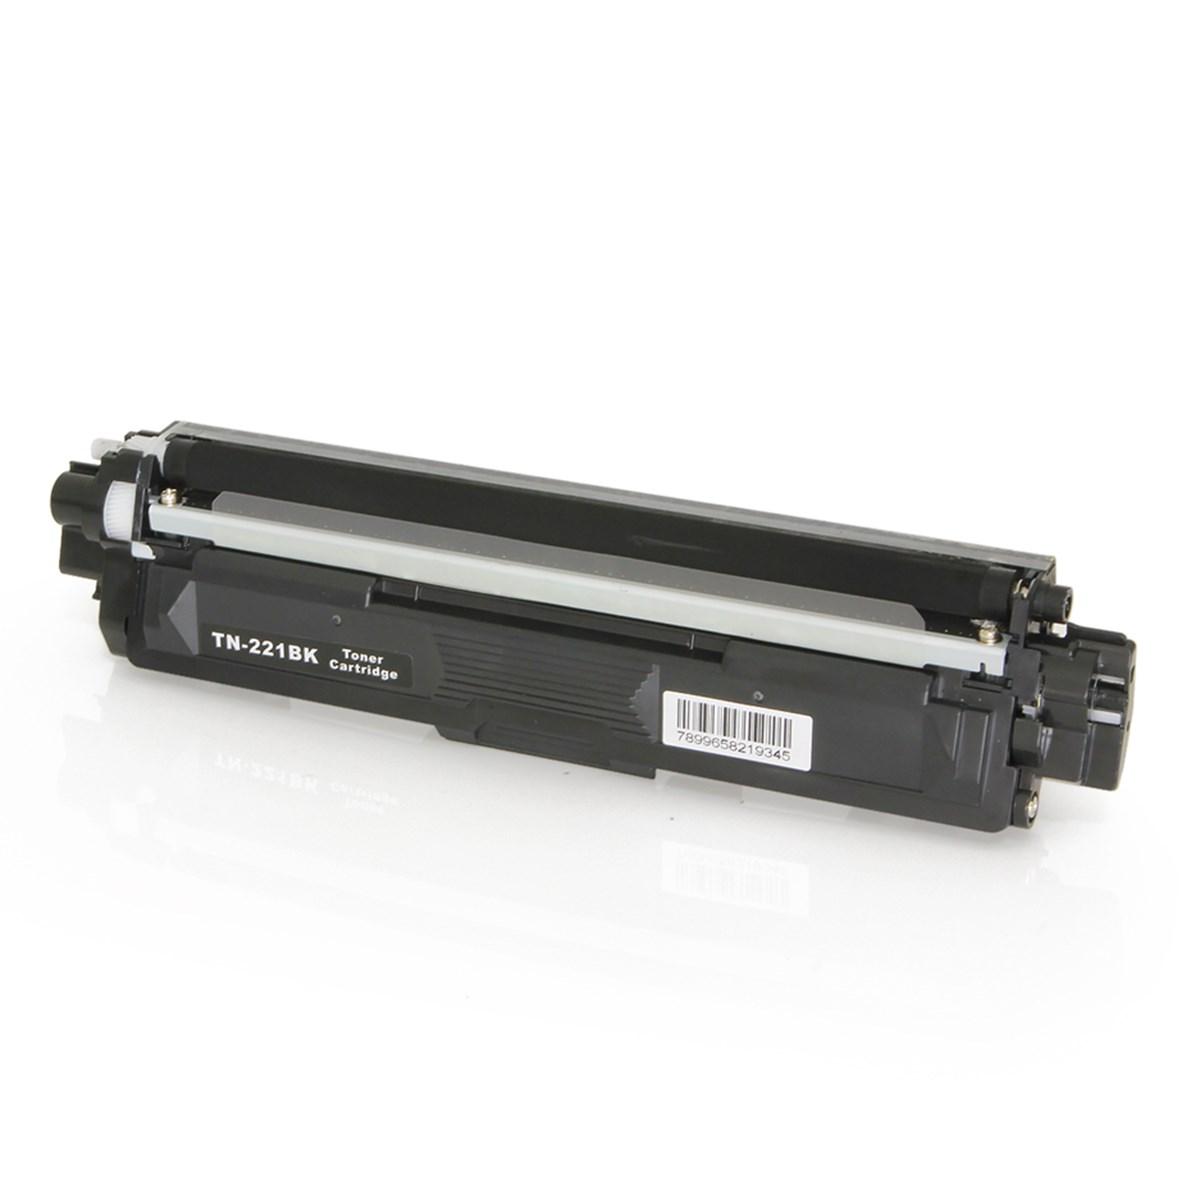 Toner TN-221BK TN221 Preto | HL3140 HL3170 DCP9020 MFC9130 MFC9330 MFC9020 | Premium 2.5k